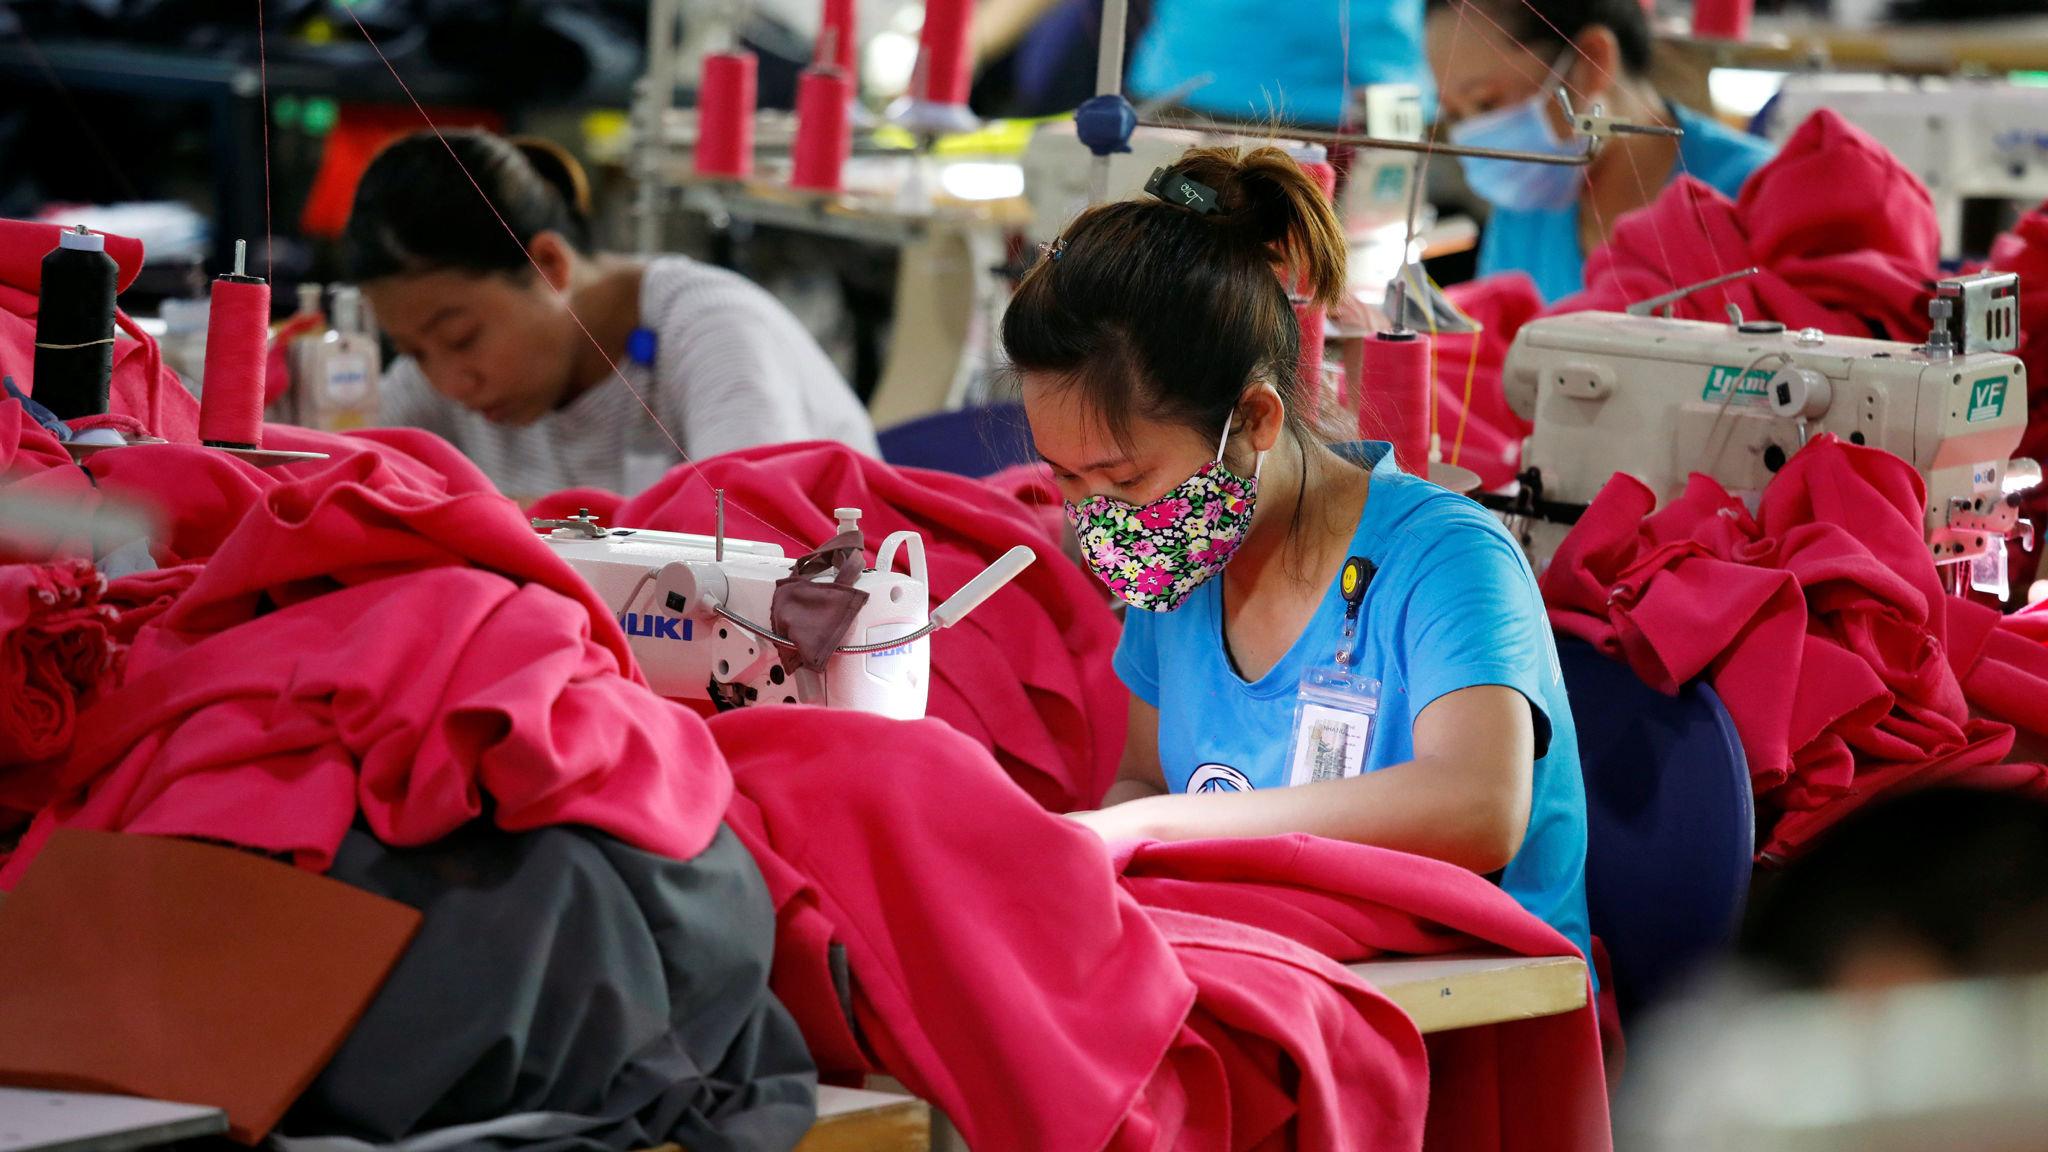 Vietnam pledges to import more US goods   Financial Times